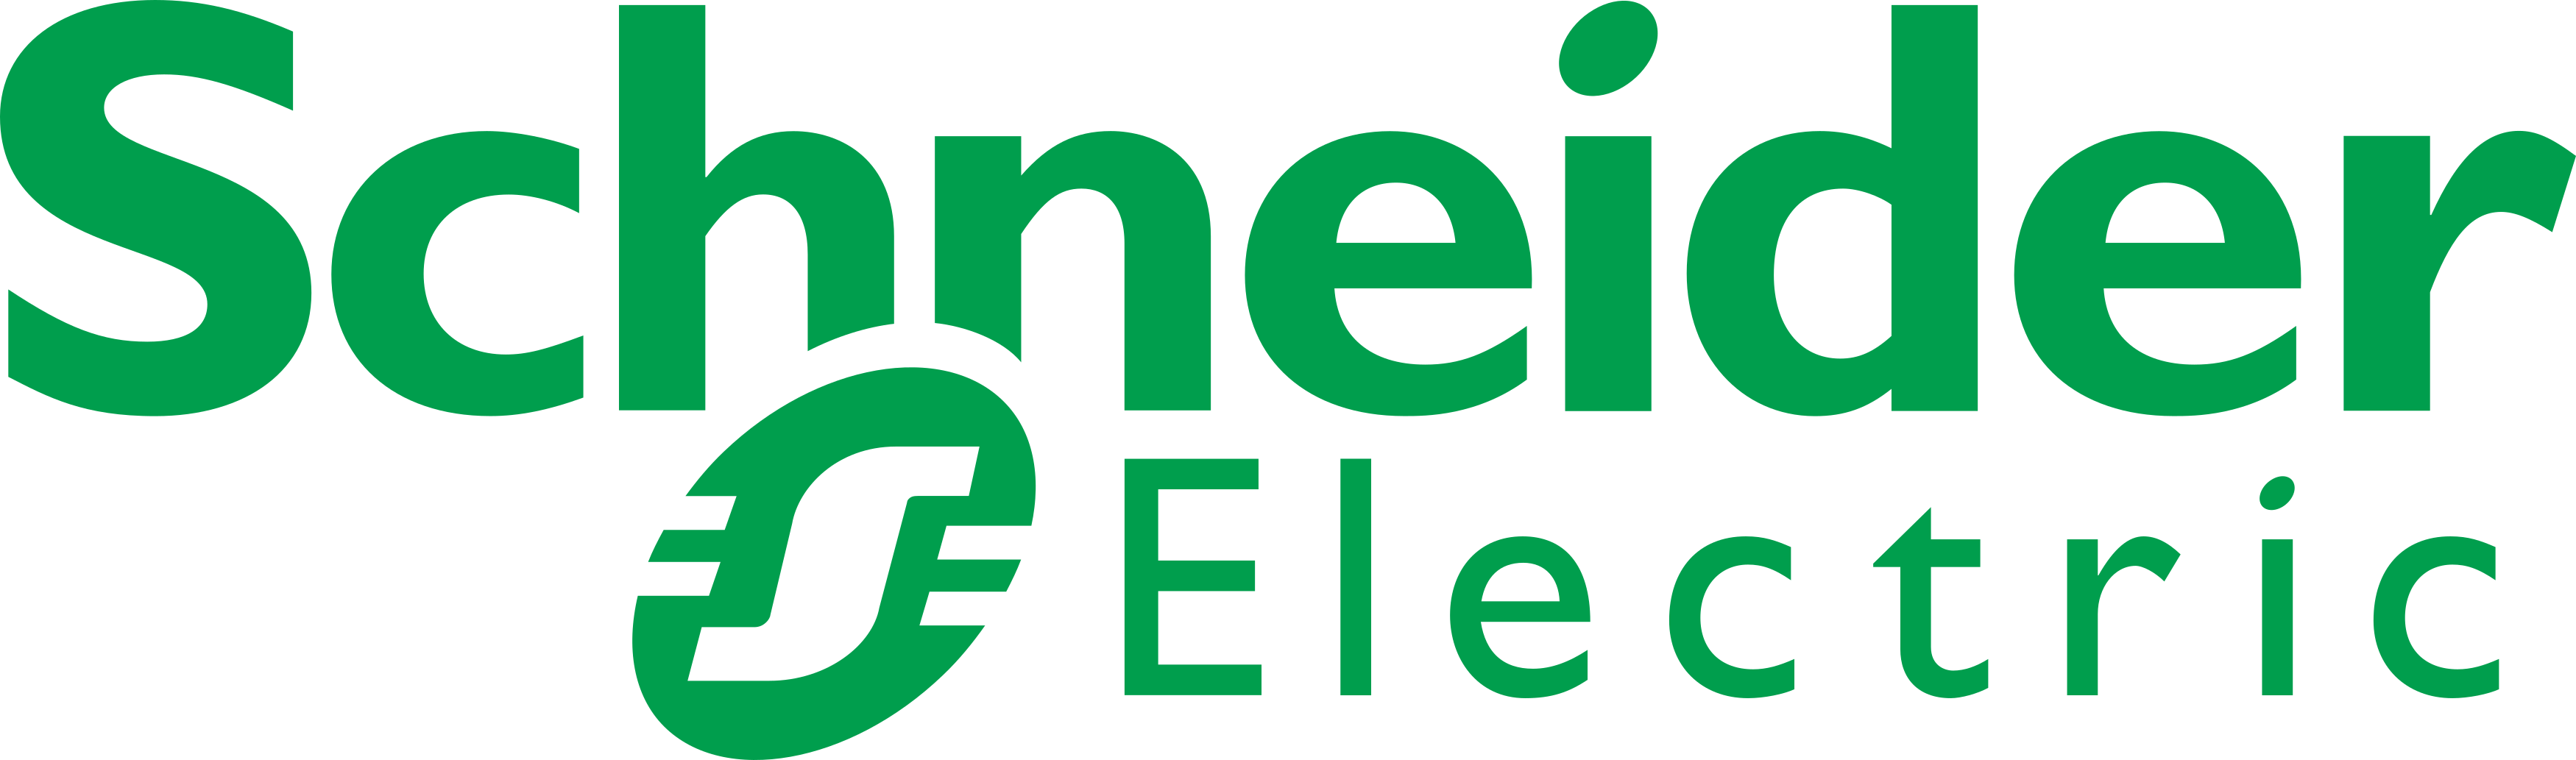 schneider sletric logo.